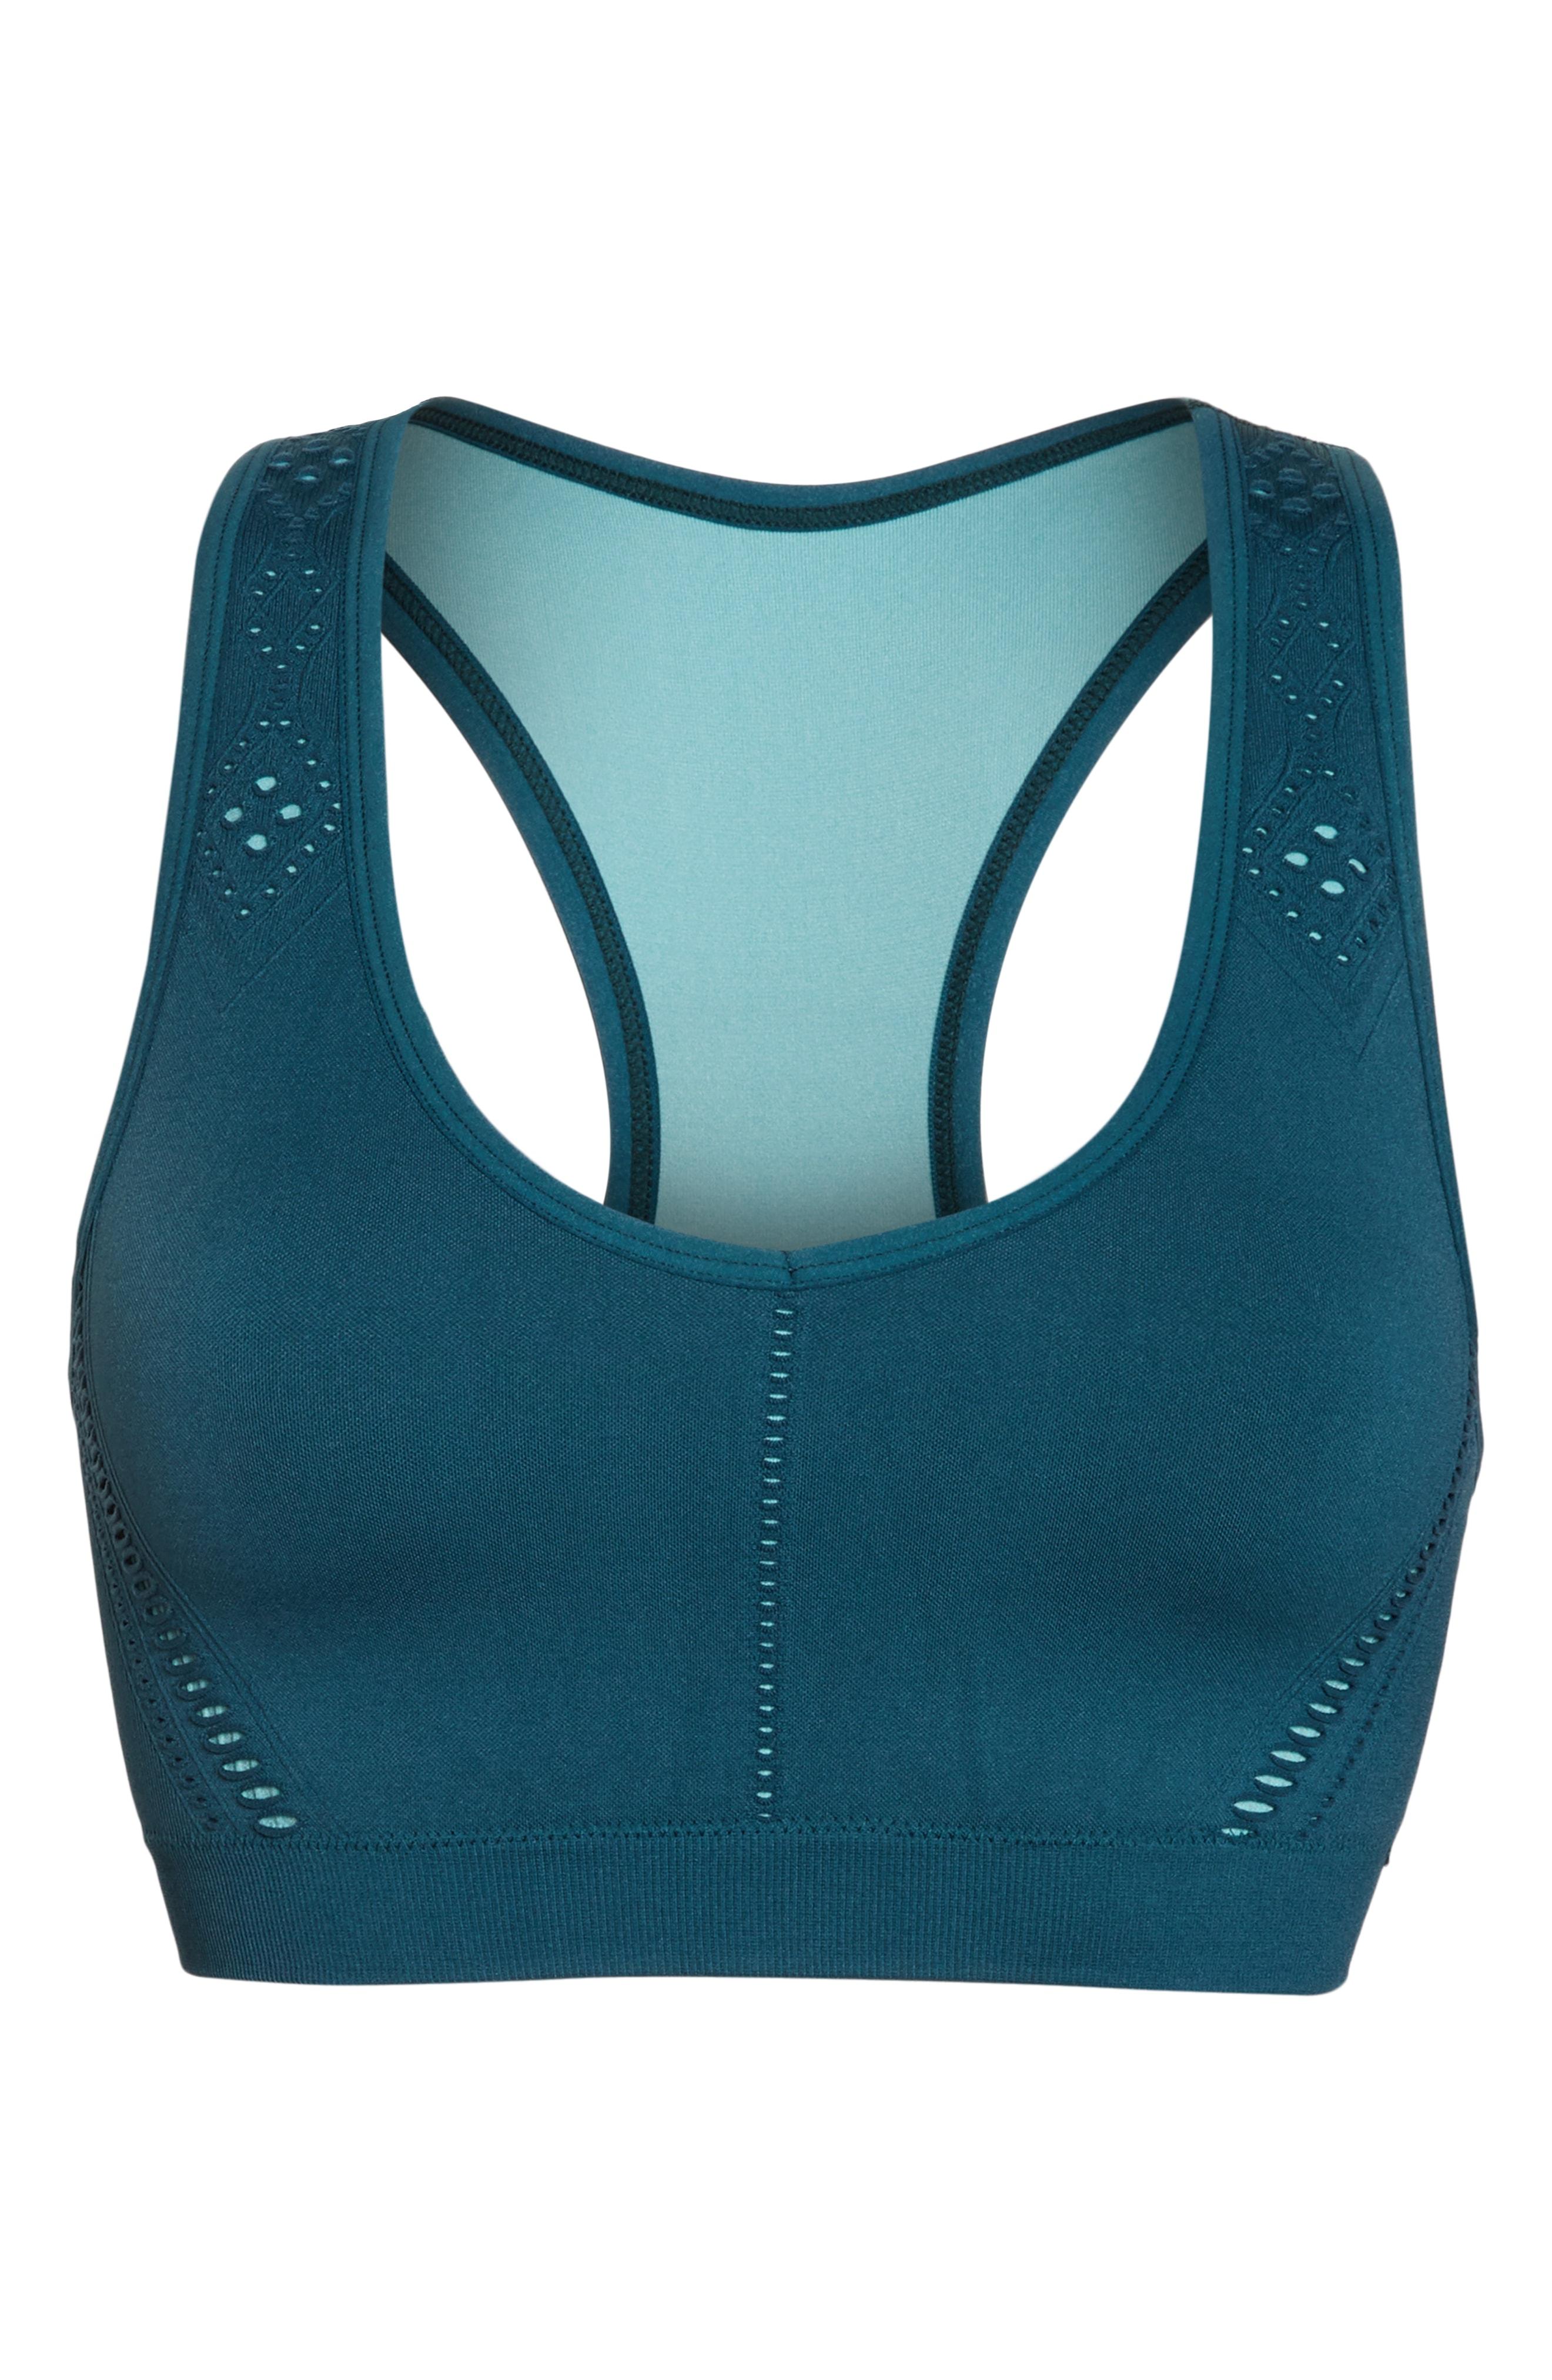 Climawear Hansa Sports Bra